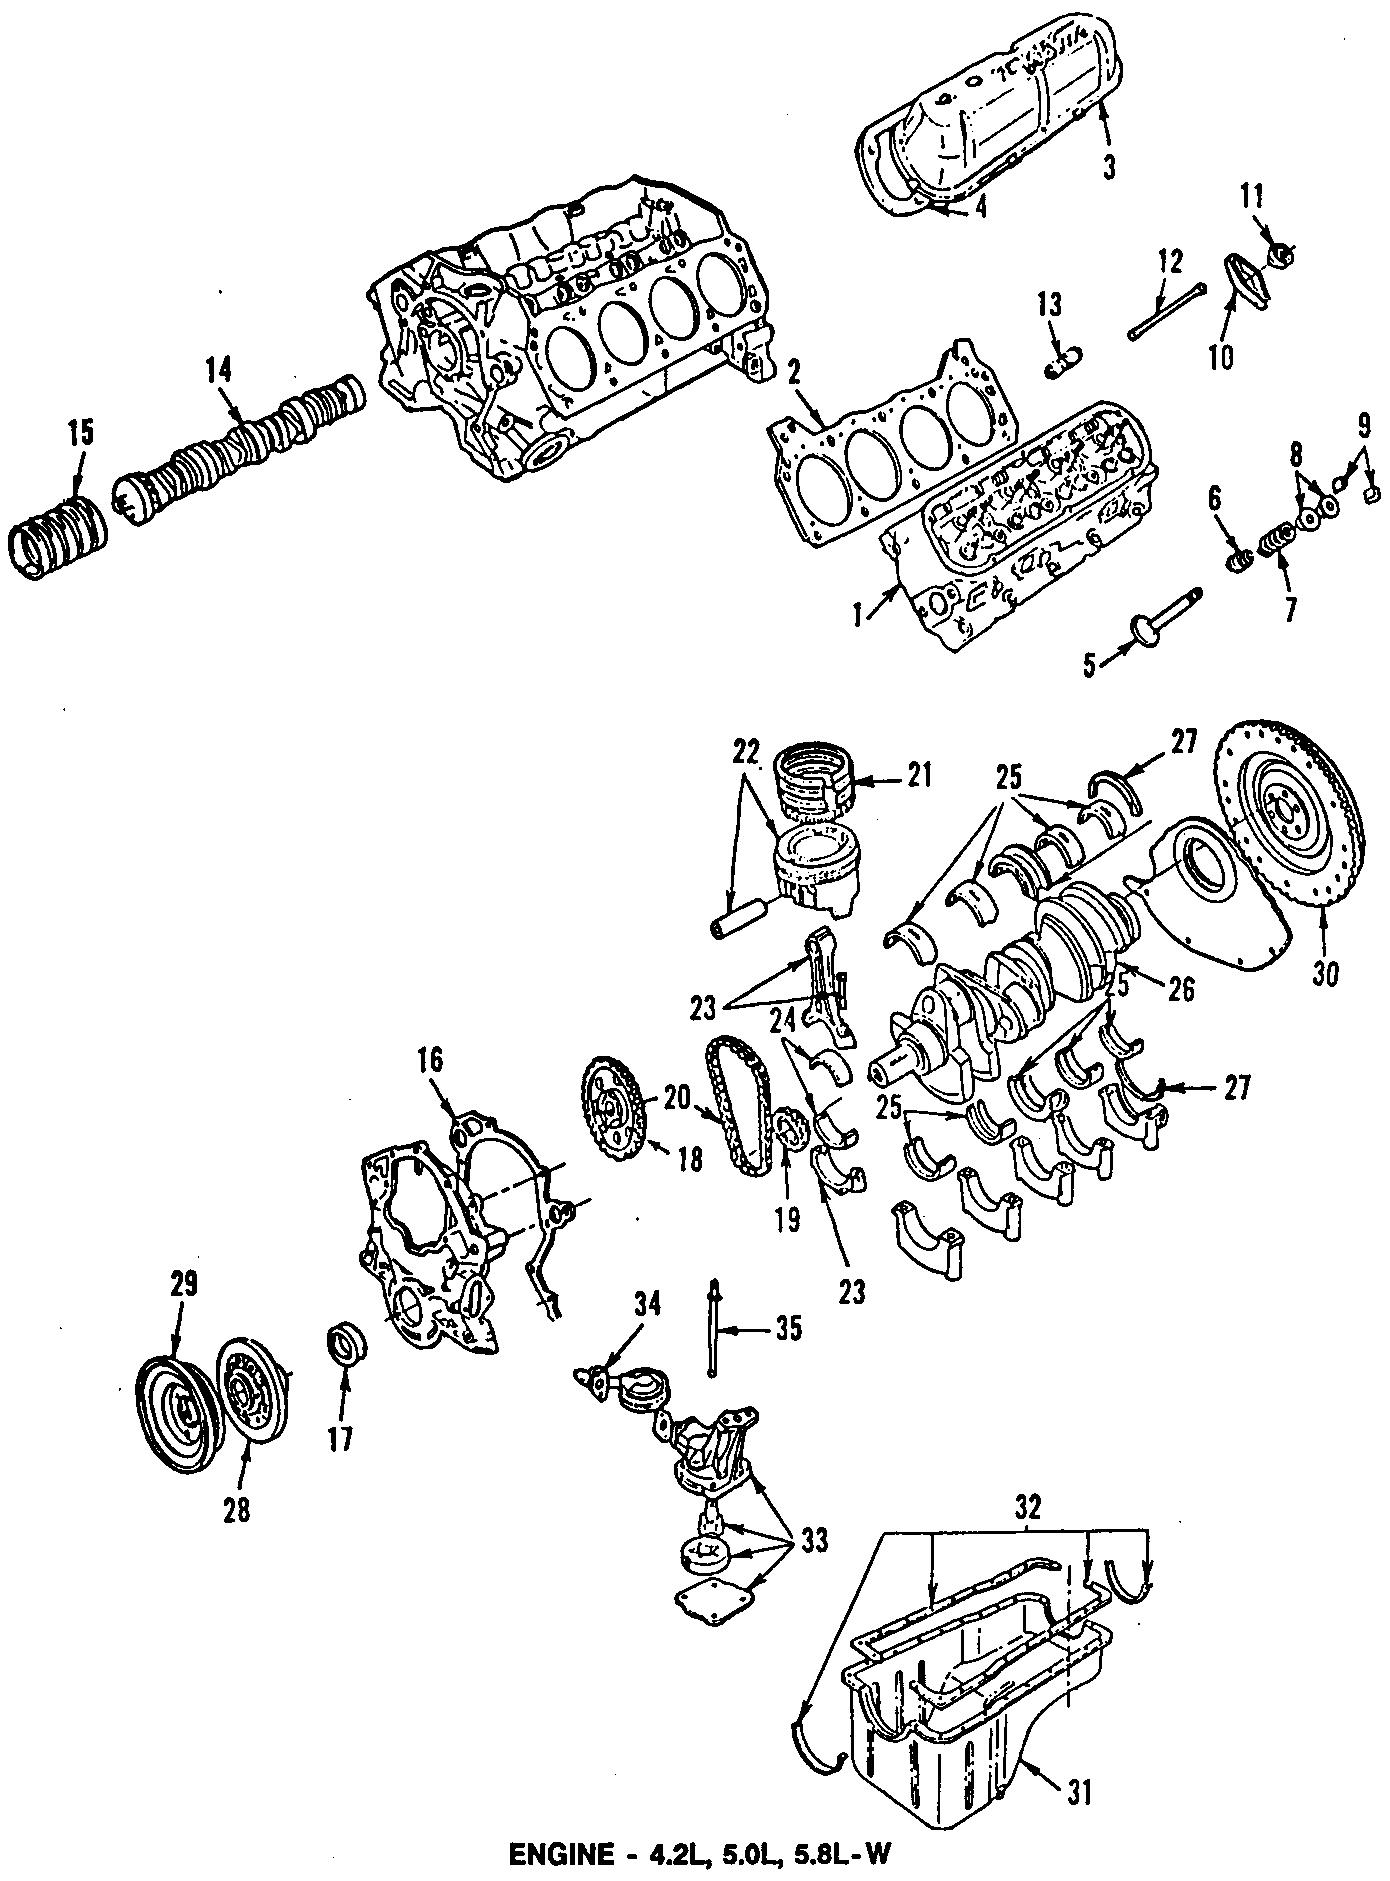 Ford F-250 Engine Valve Cover Gasket. LITER, BEARINGS, VII